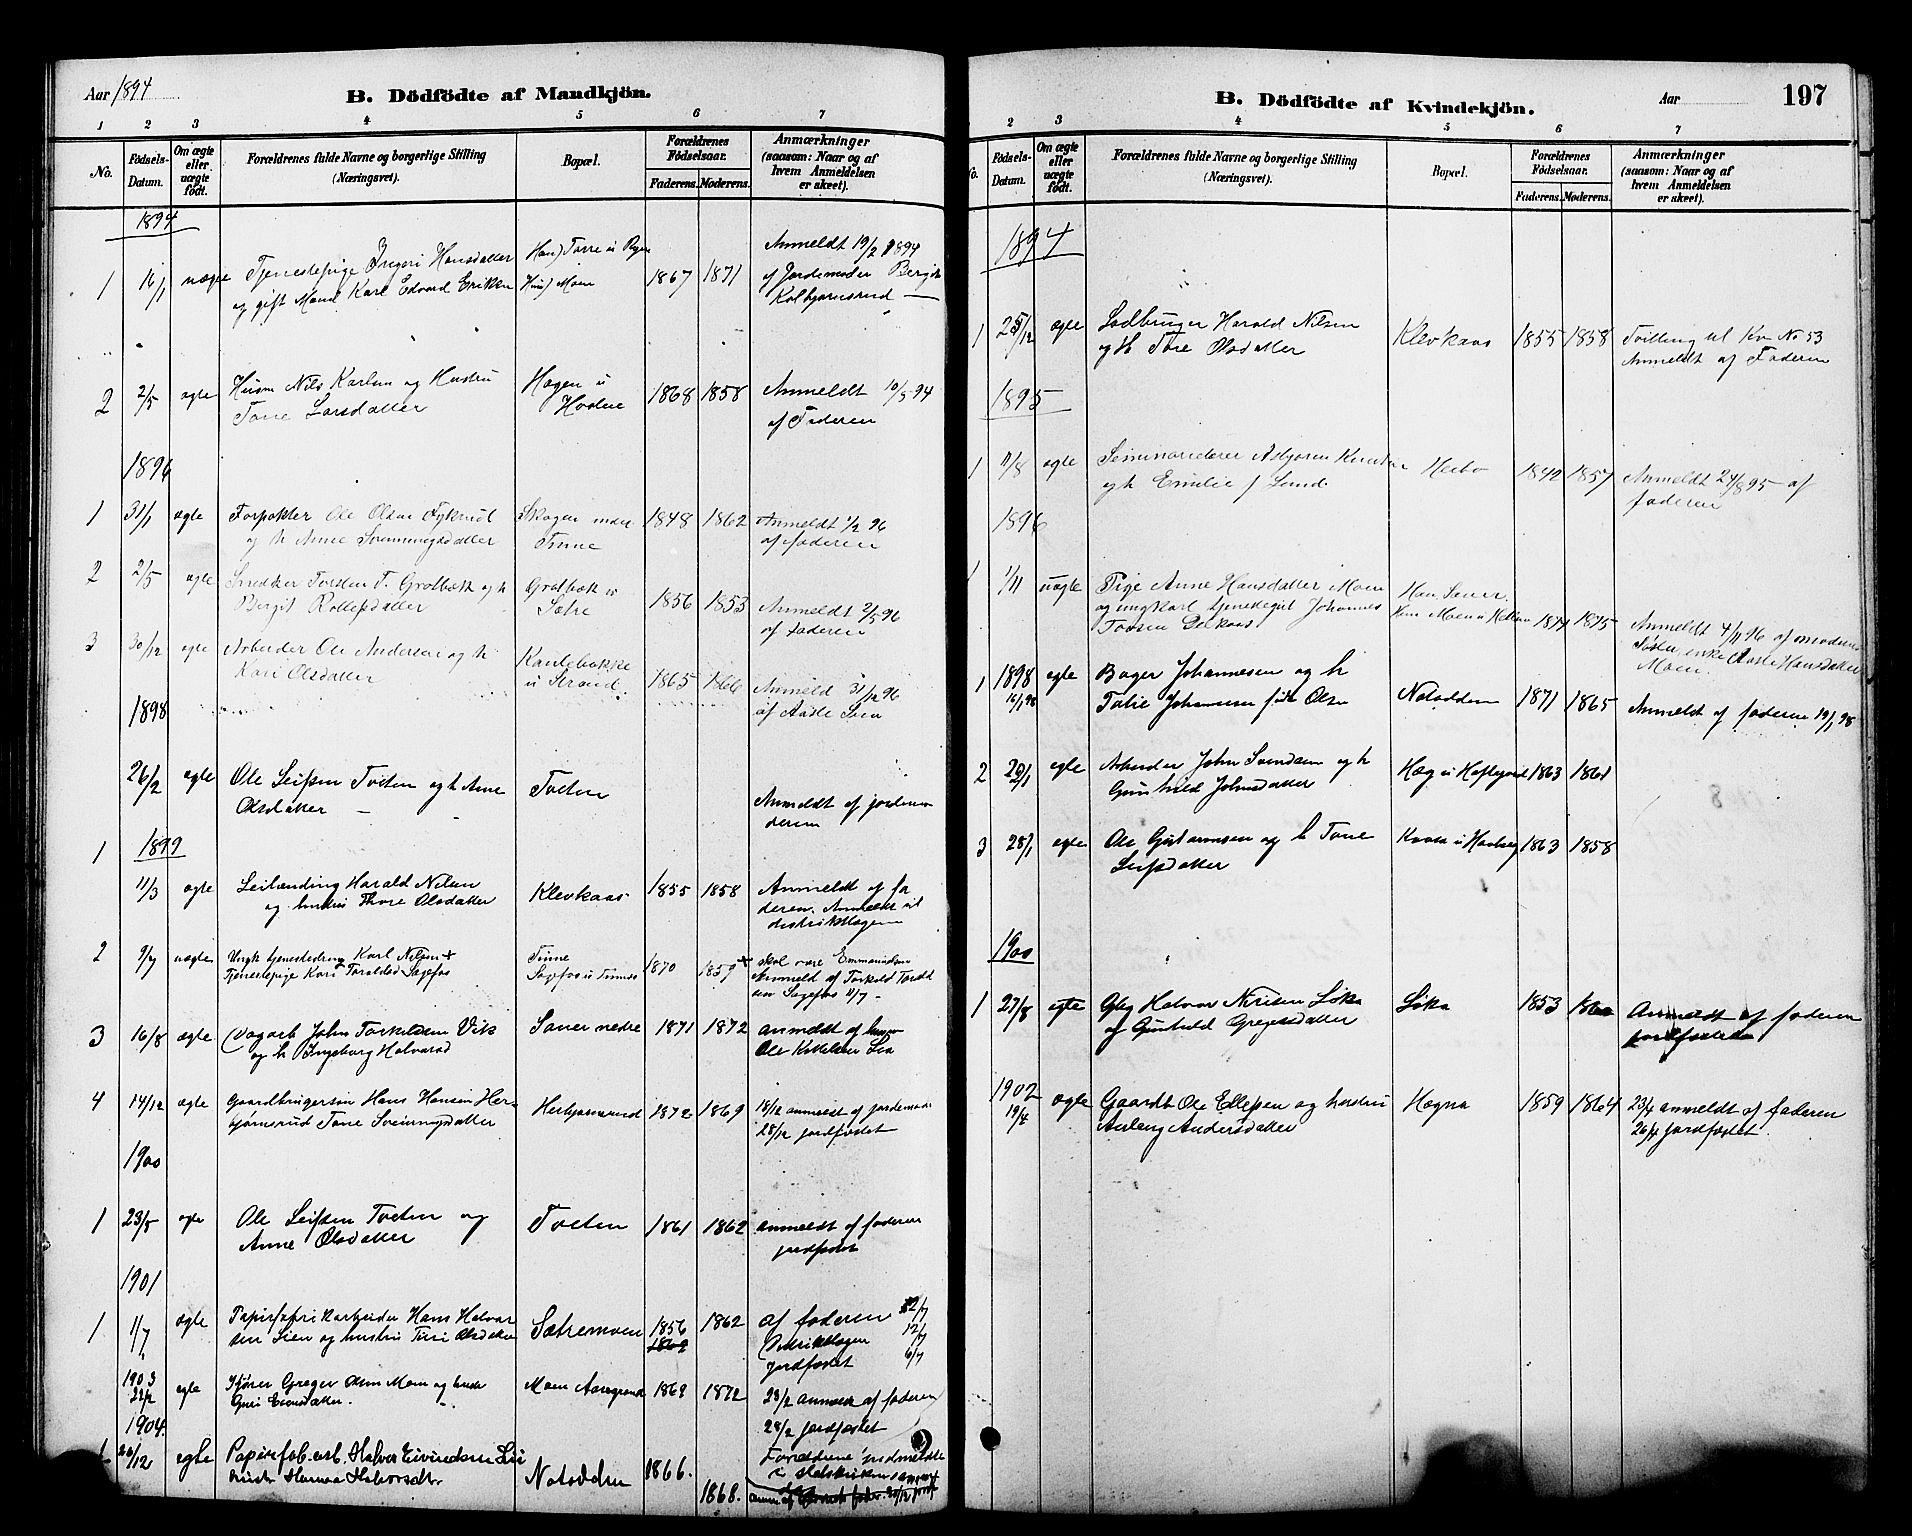 SAKO, Heddal kirkebøker, G/Ga/L0002: Klokkerbok nr. I 2, 1879-1908, s. 197